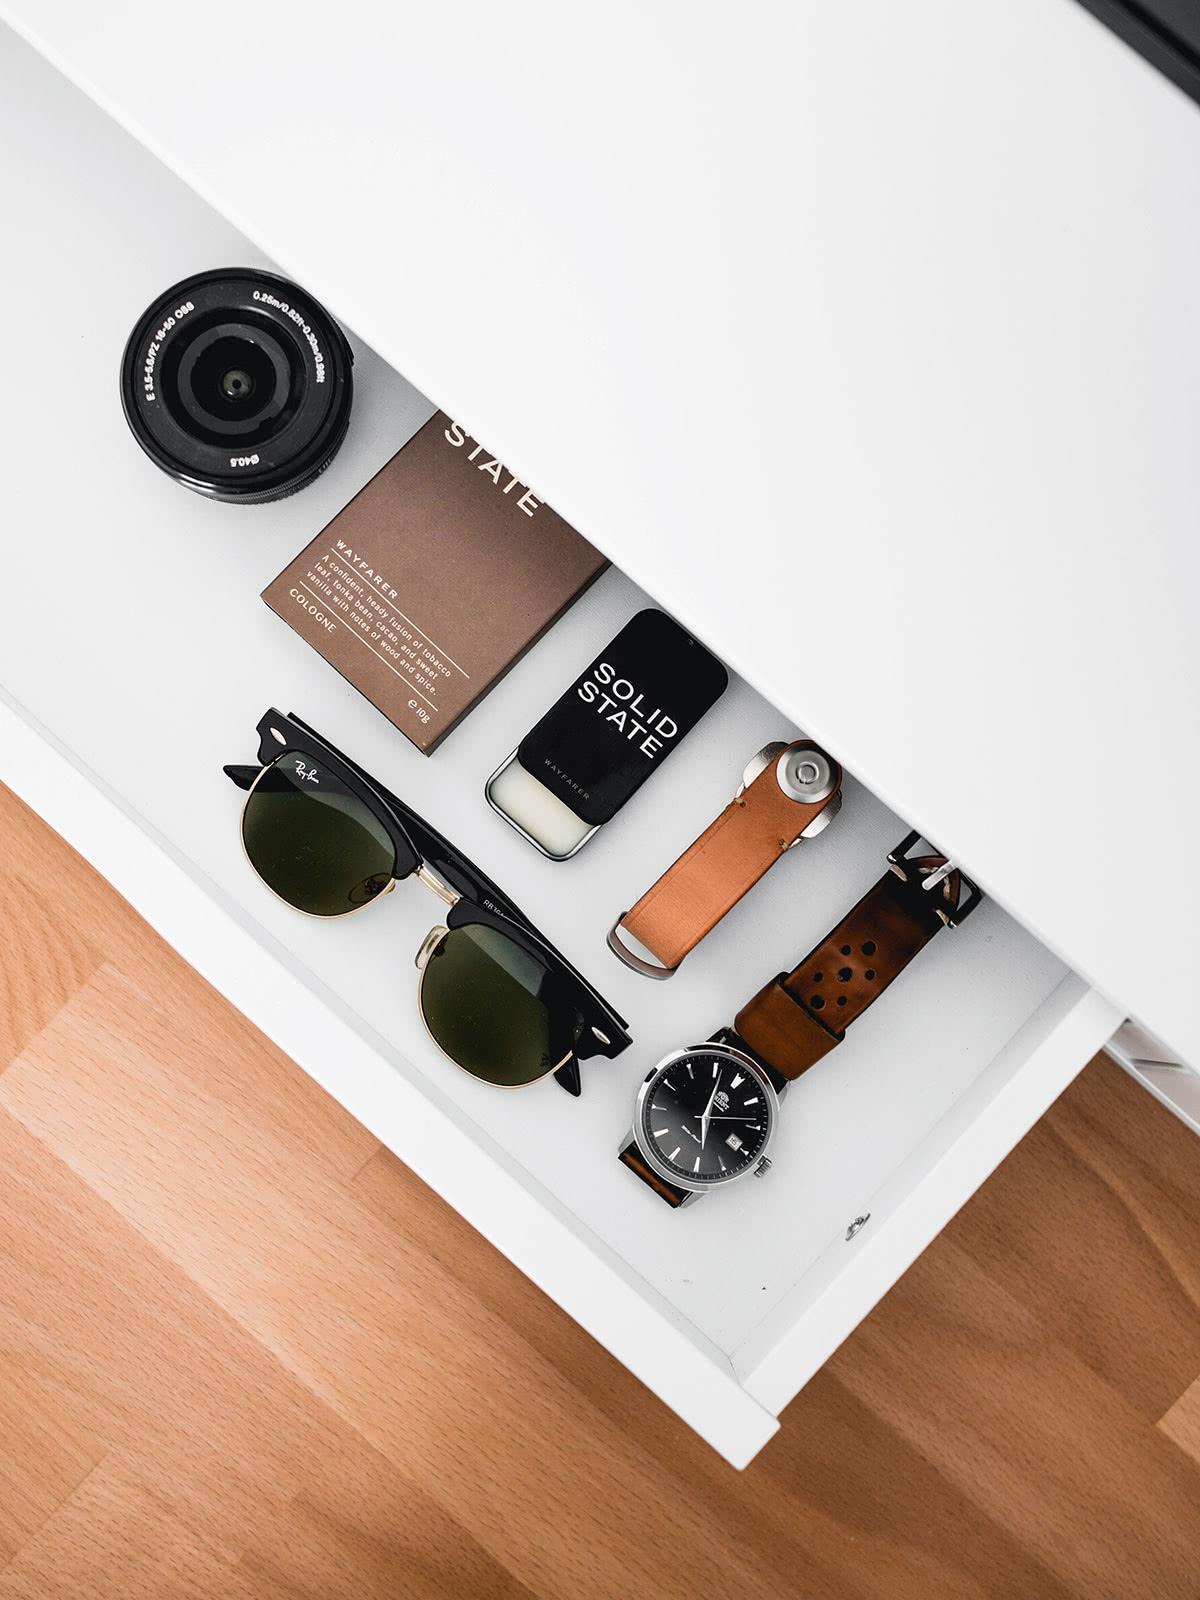 Casual men dress code accessories - Luxe Digital